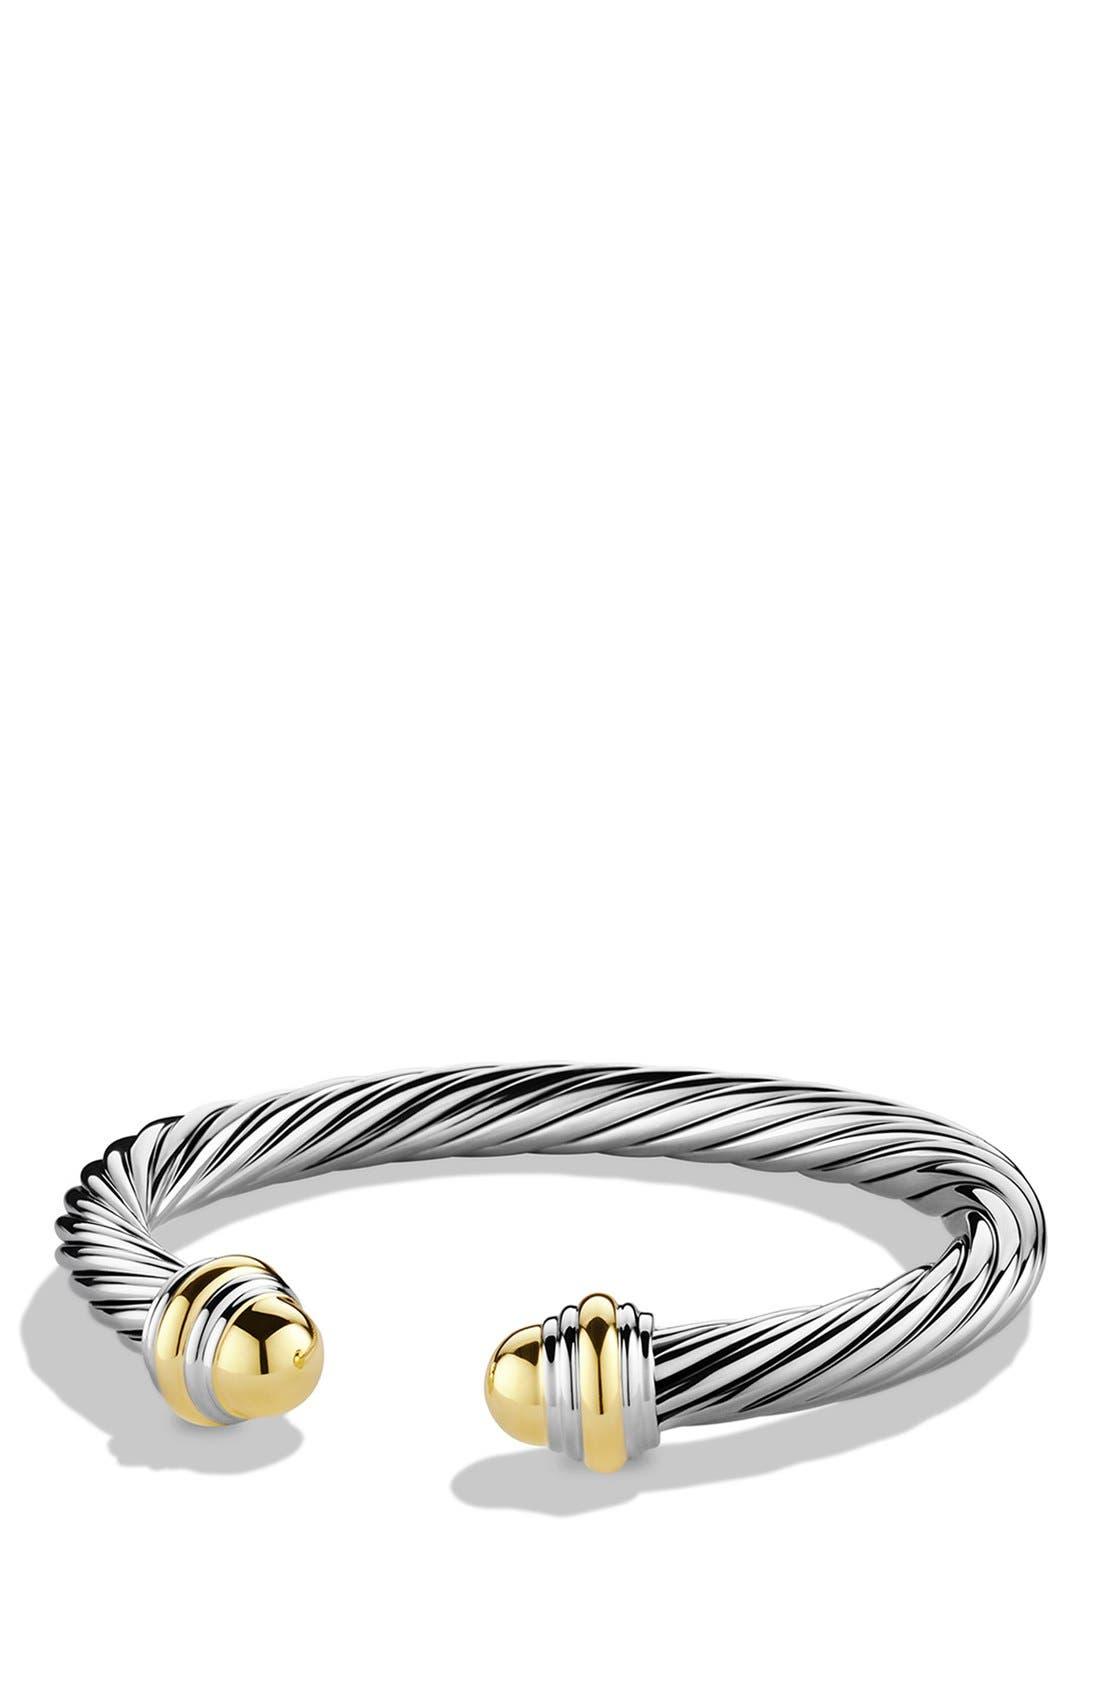 DAVID YURMAN, Cable Classics Bracelet with 14K Gold, 7mm, Main thumbnail 1, color, GOLD DOME